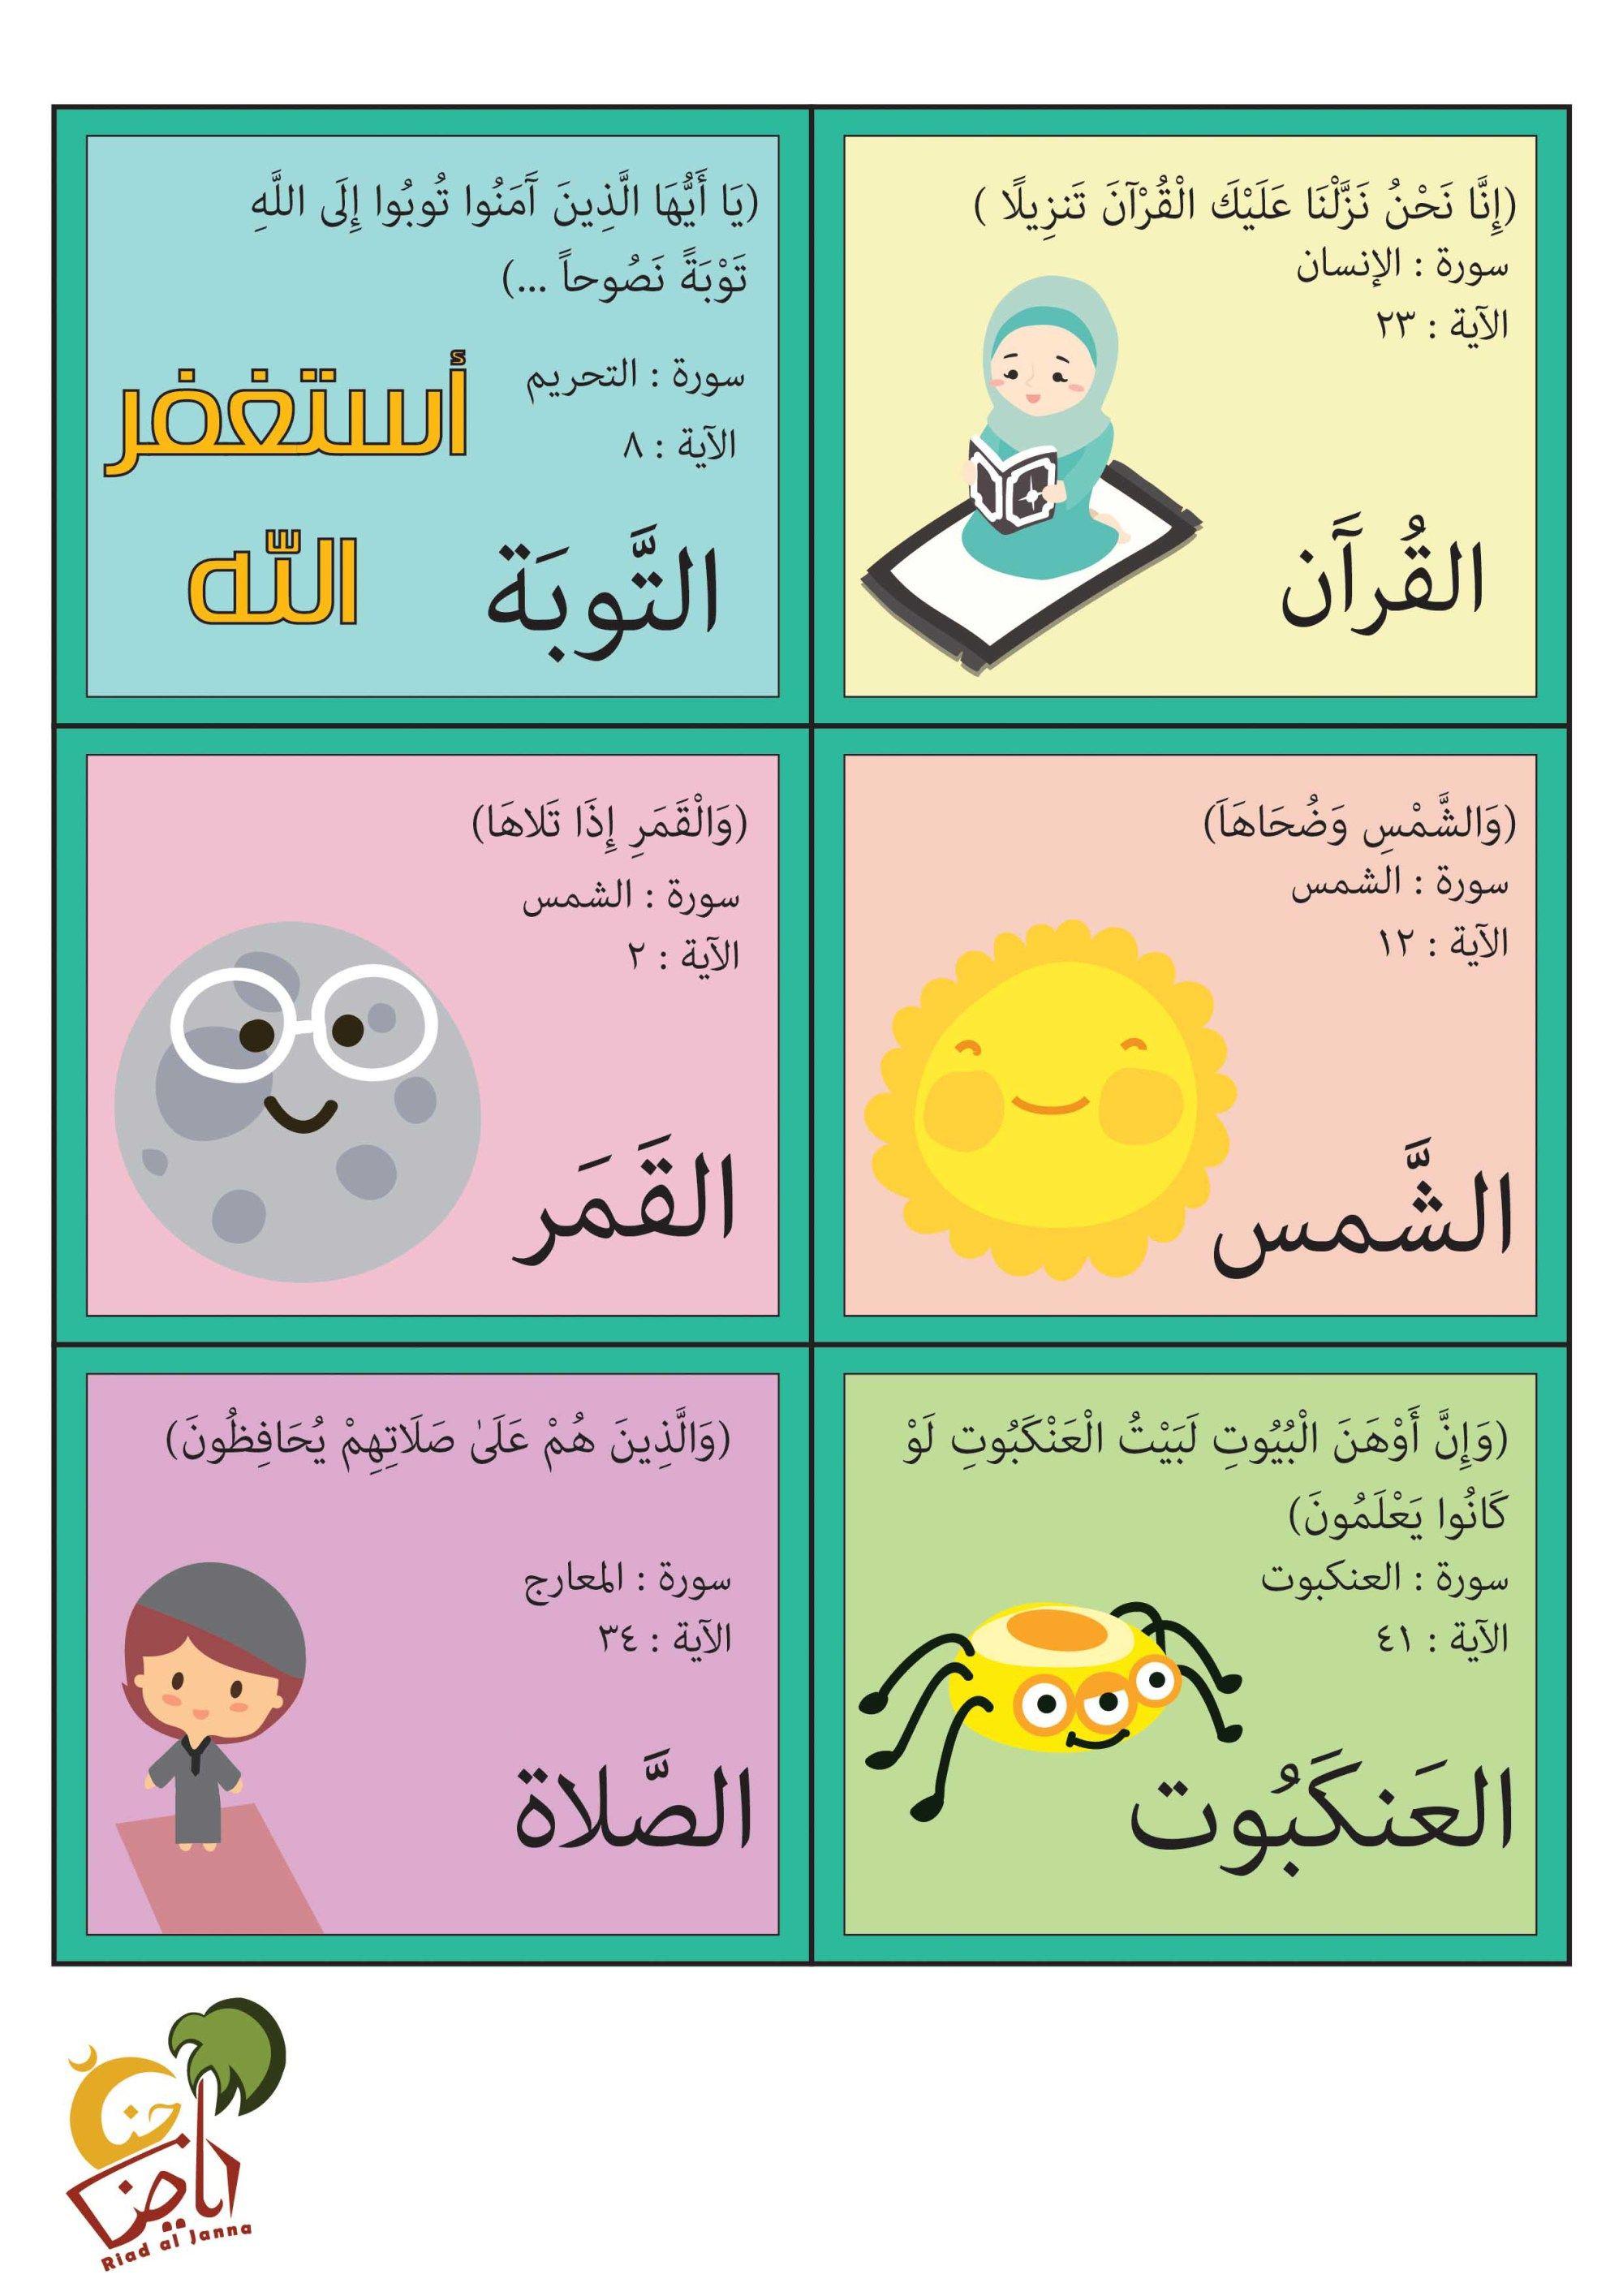 نموذج البطاقات Muslim Kids Activities Islamic Kids Activities Arabic Kids